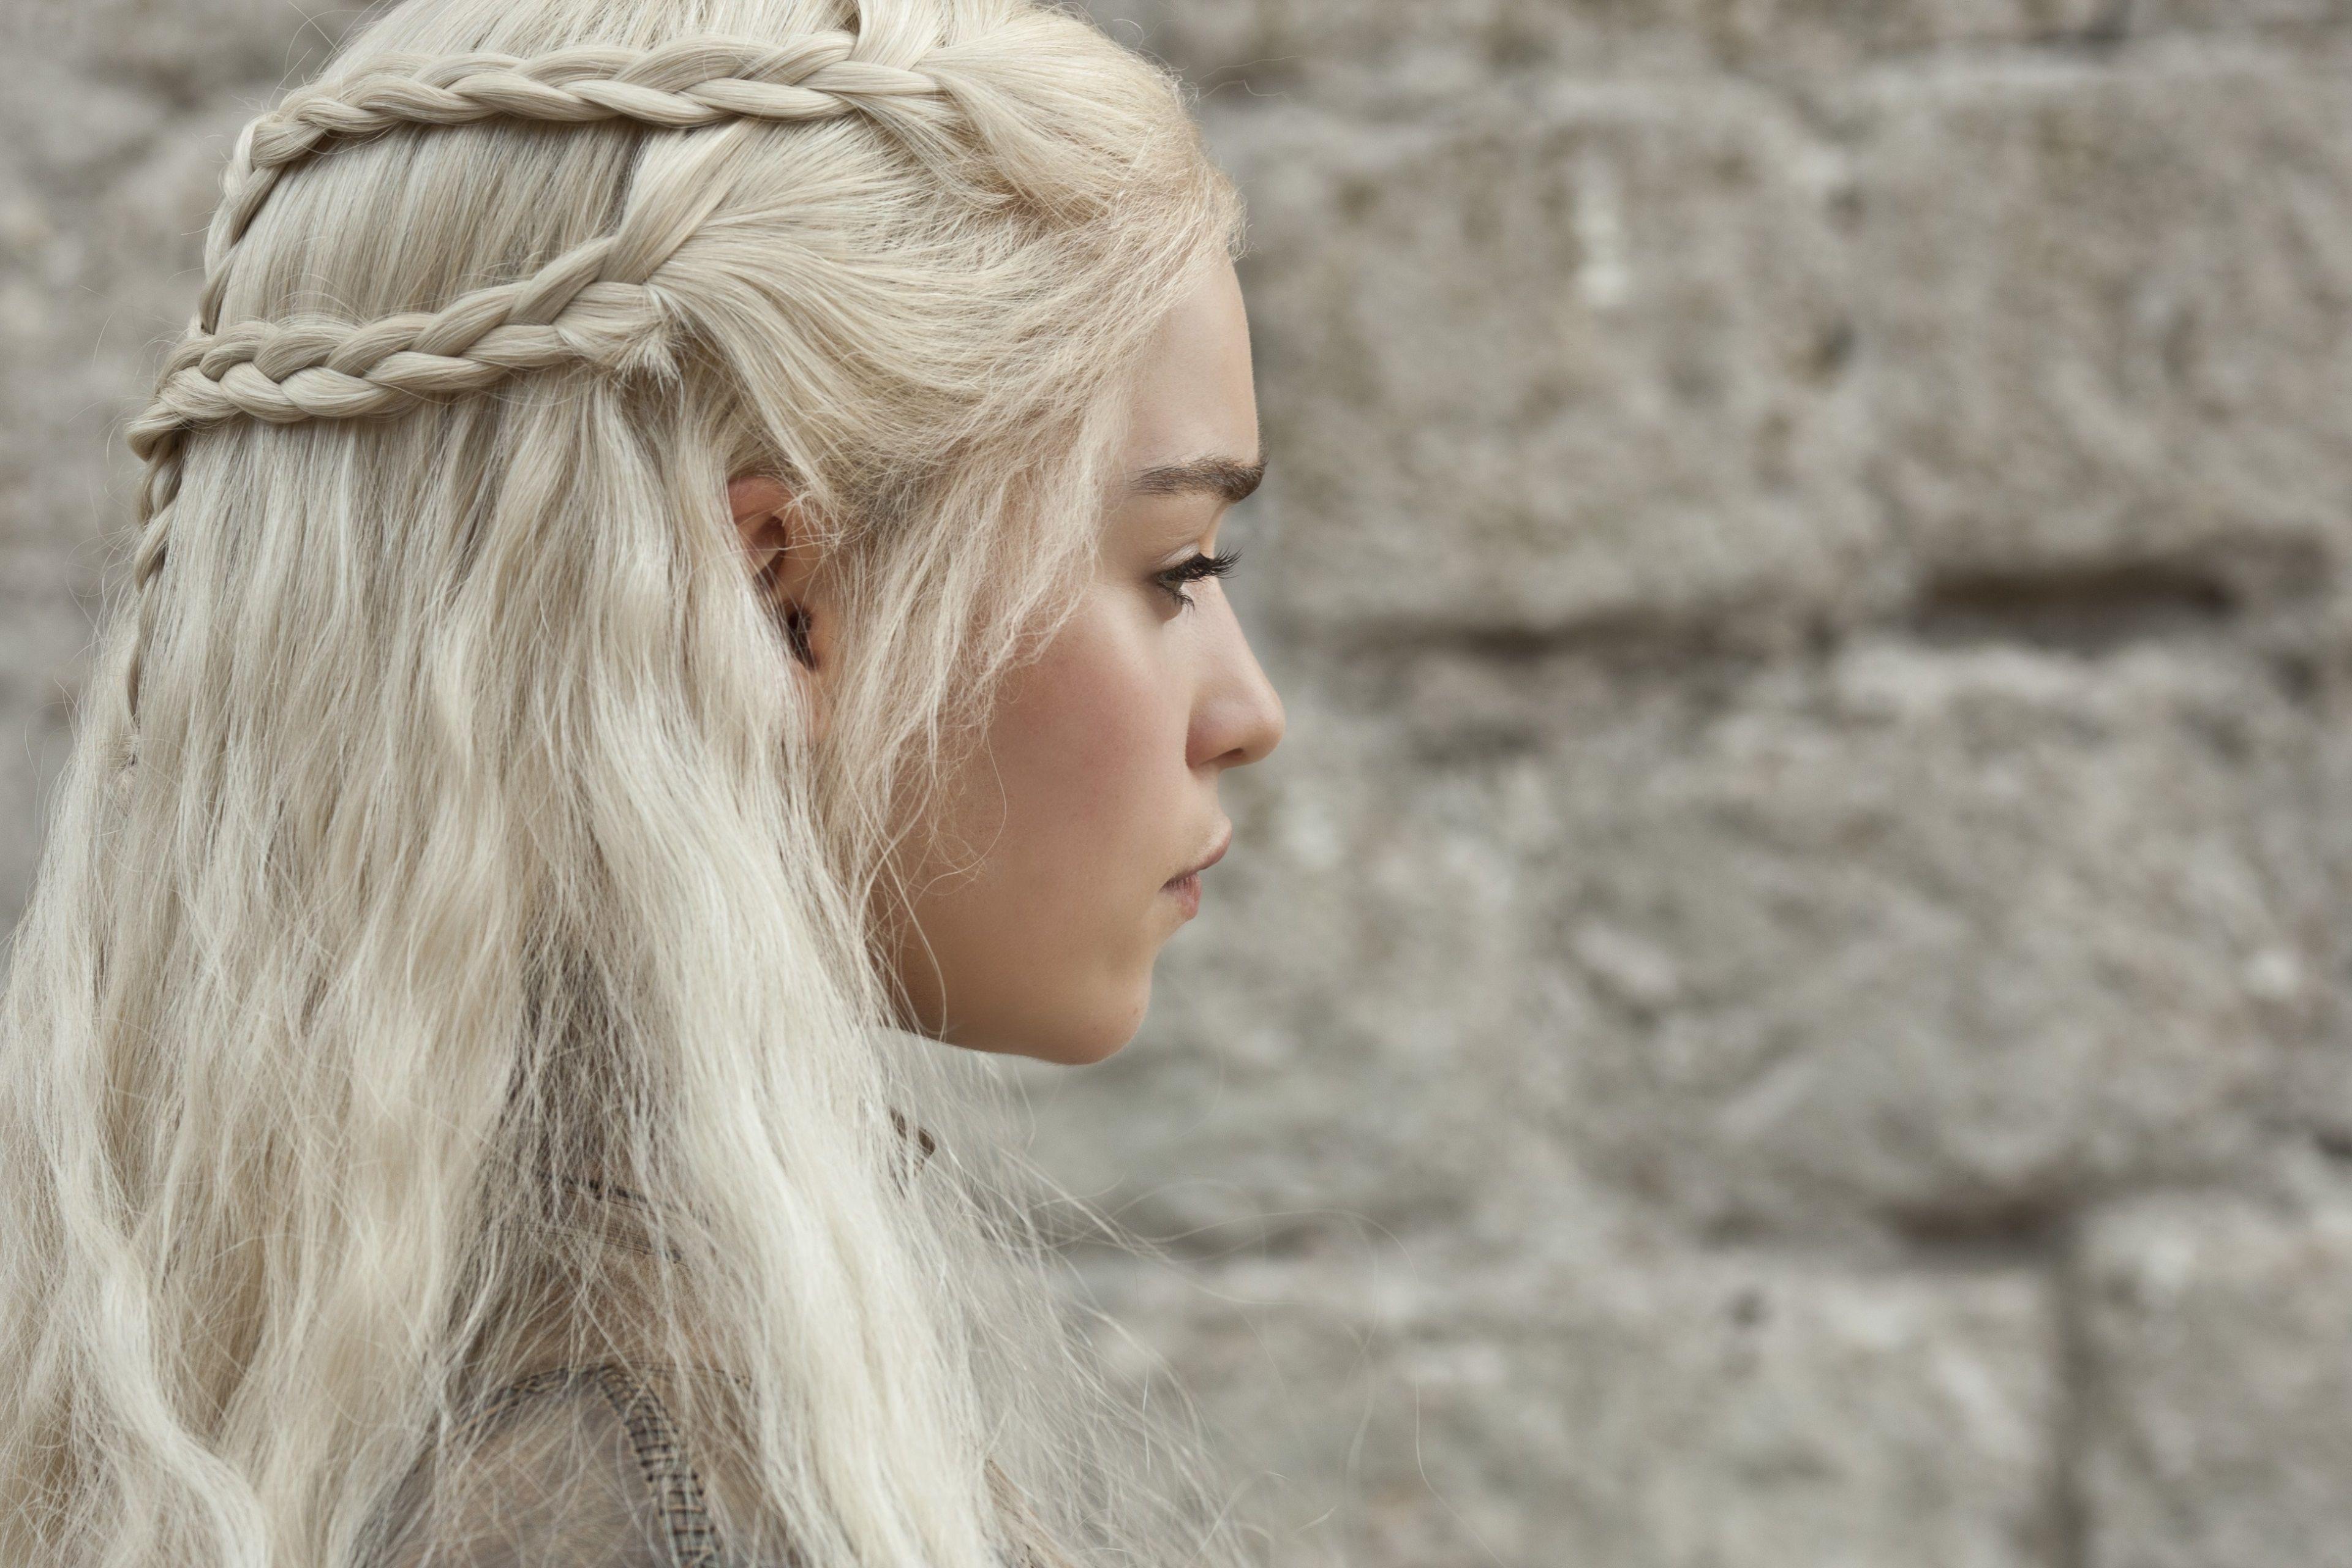 3840x2560 Daenerys Targaryen 4k Download Wallpaper Free Game Of Throne Daenerys Daenerys Targaryen Wallpaper Hair